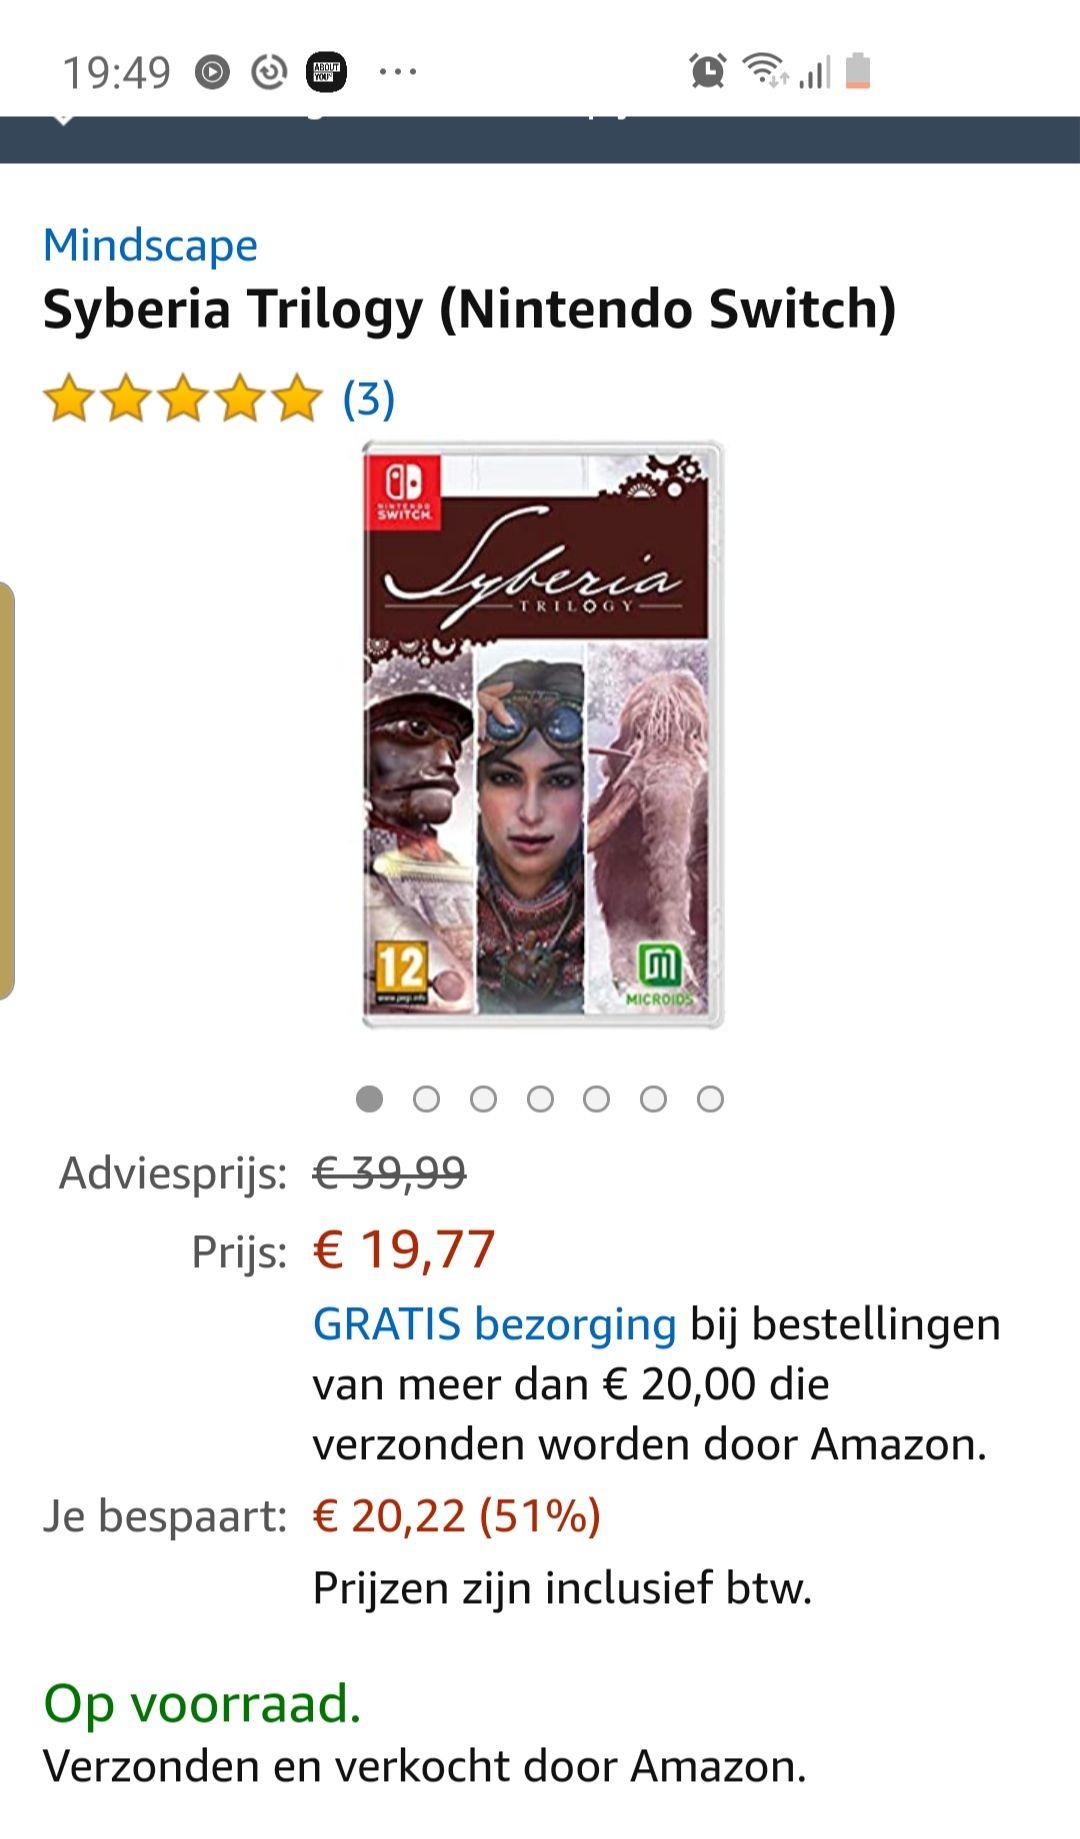 Syberia trilogy nintendo switch @ Amazon.nl